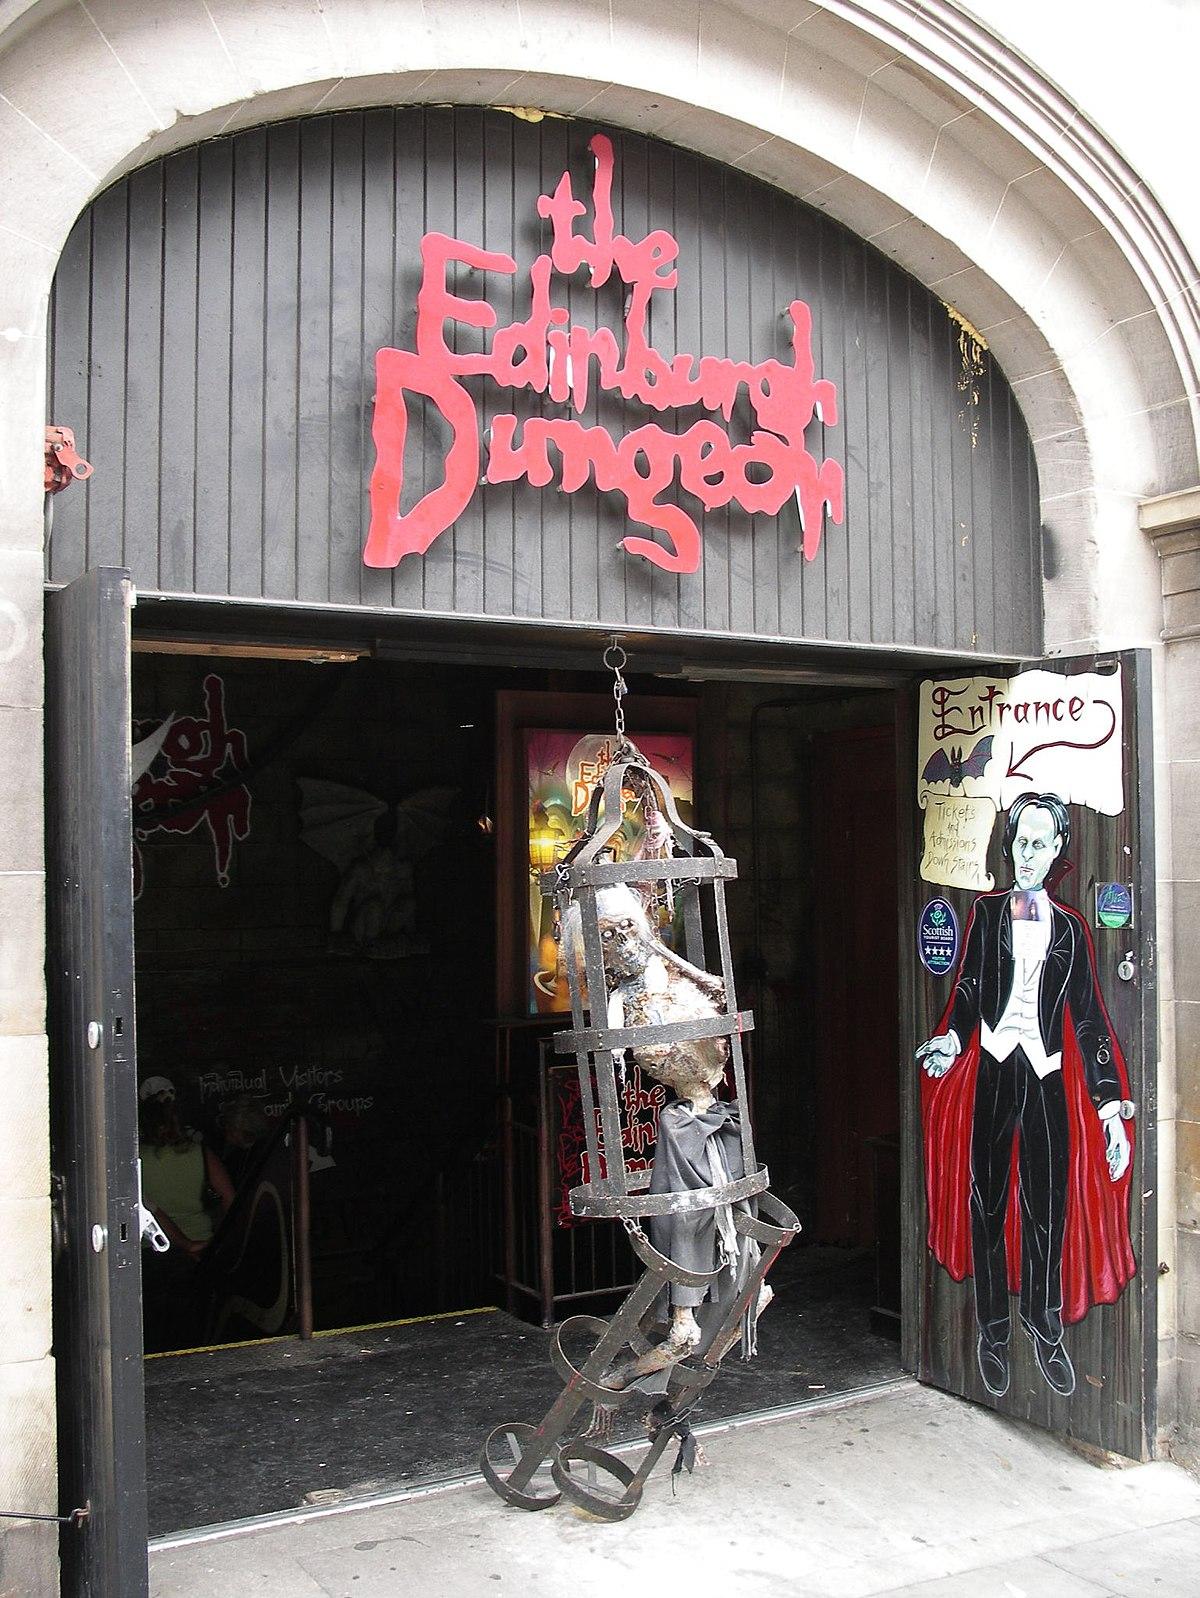 Edinburgh Dungeon 01 (223052043).jpg